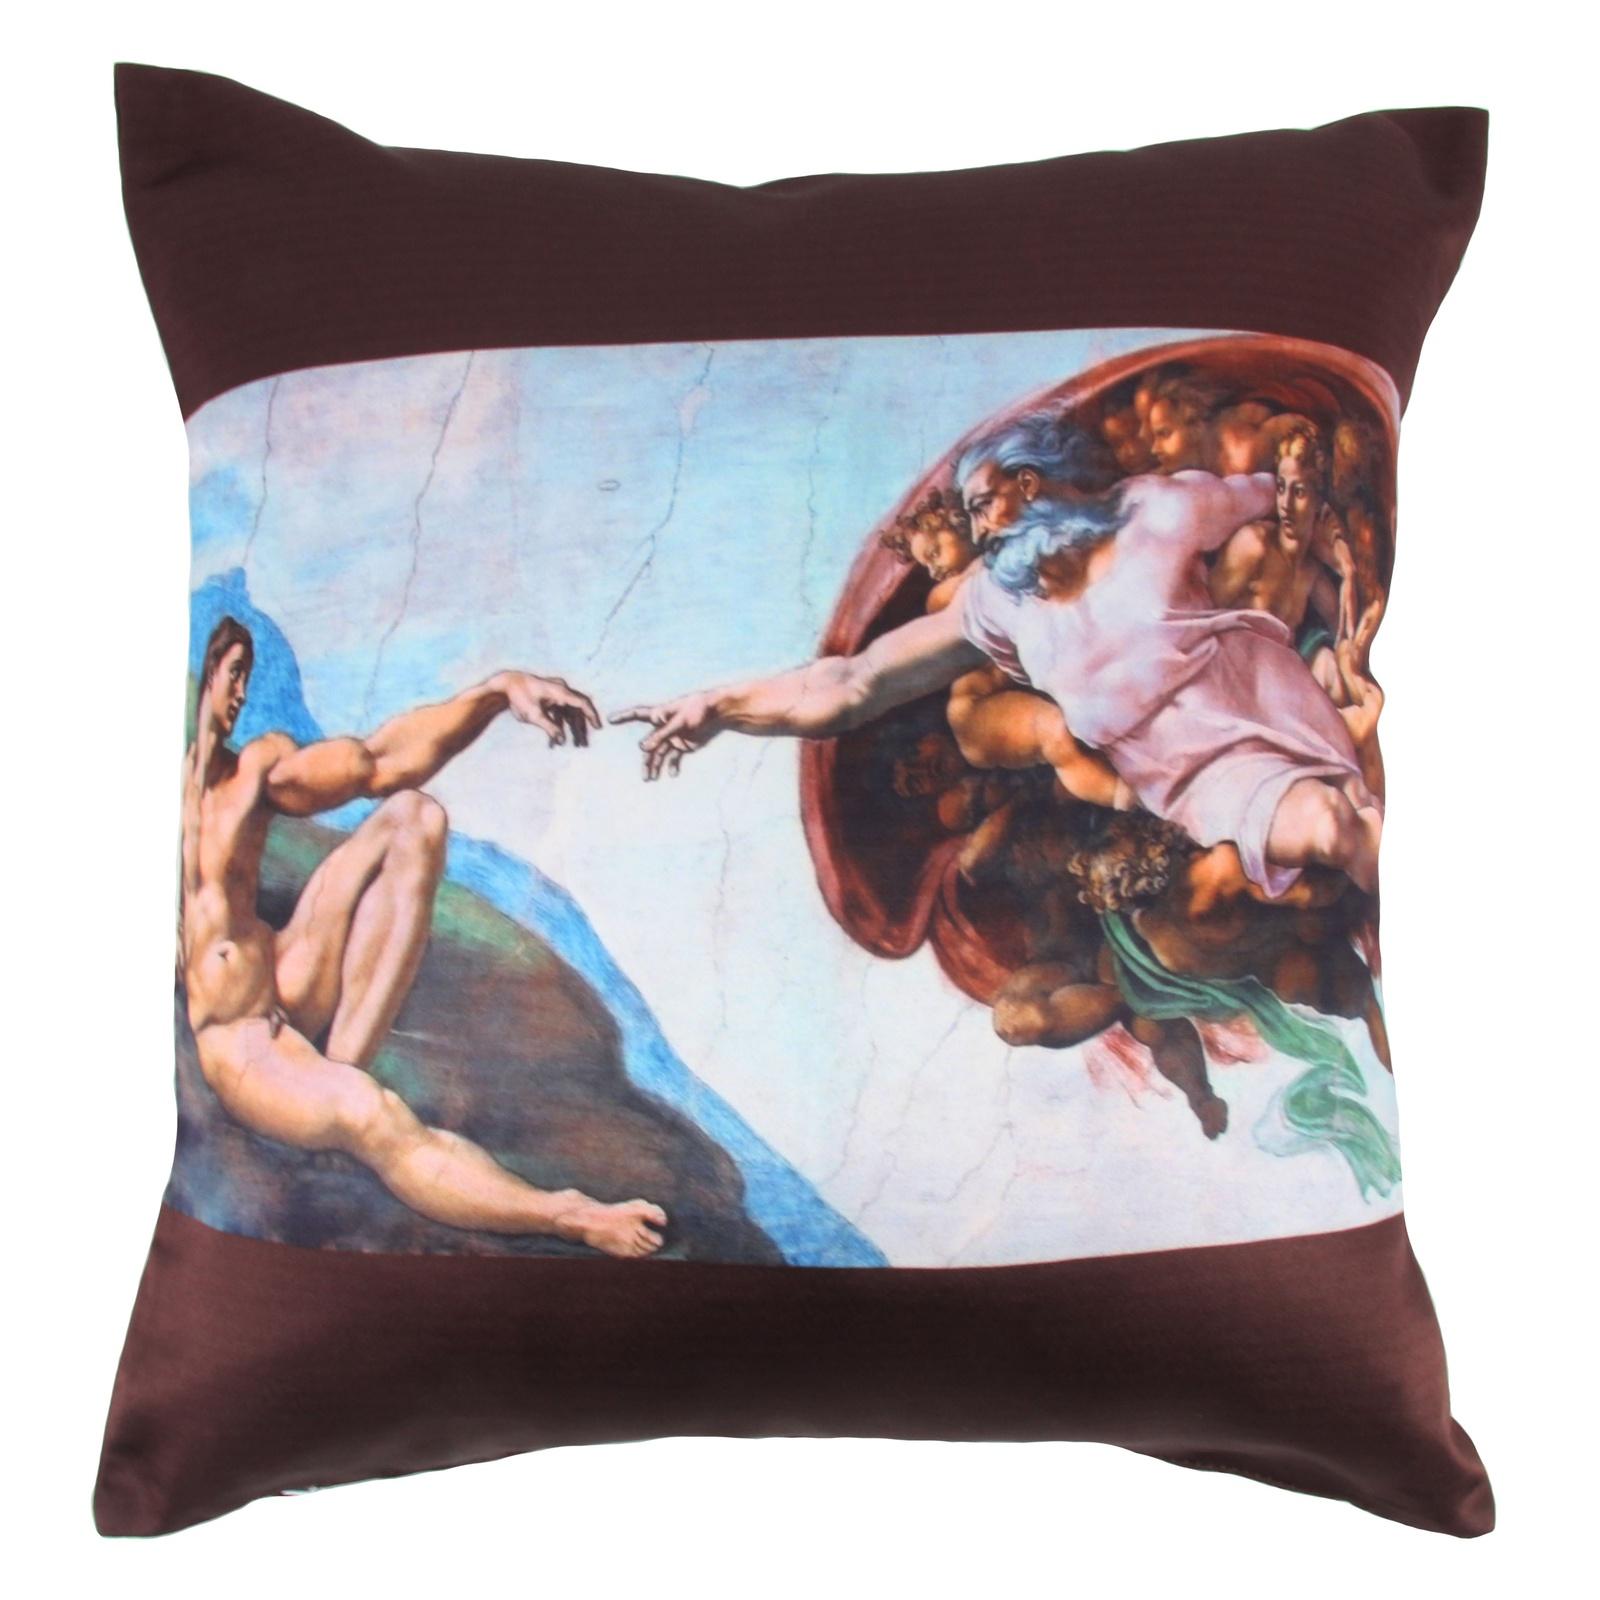 Наволочка декоративная Рапира Сотворение Адама, 295, белый, голубой, коричневый, 45х45 см декоративные подушки tango декоративная наволочка emily 45х45